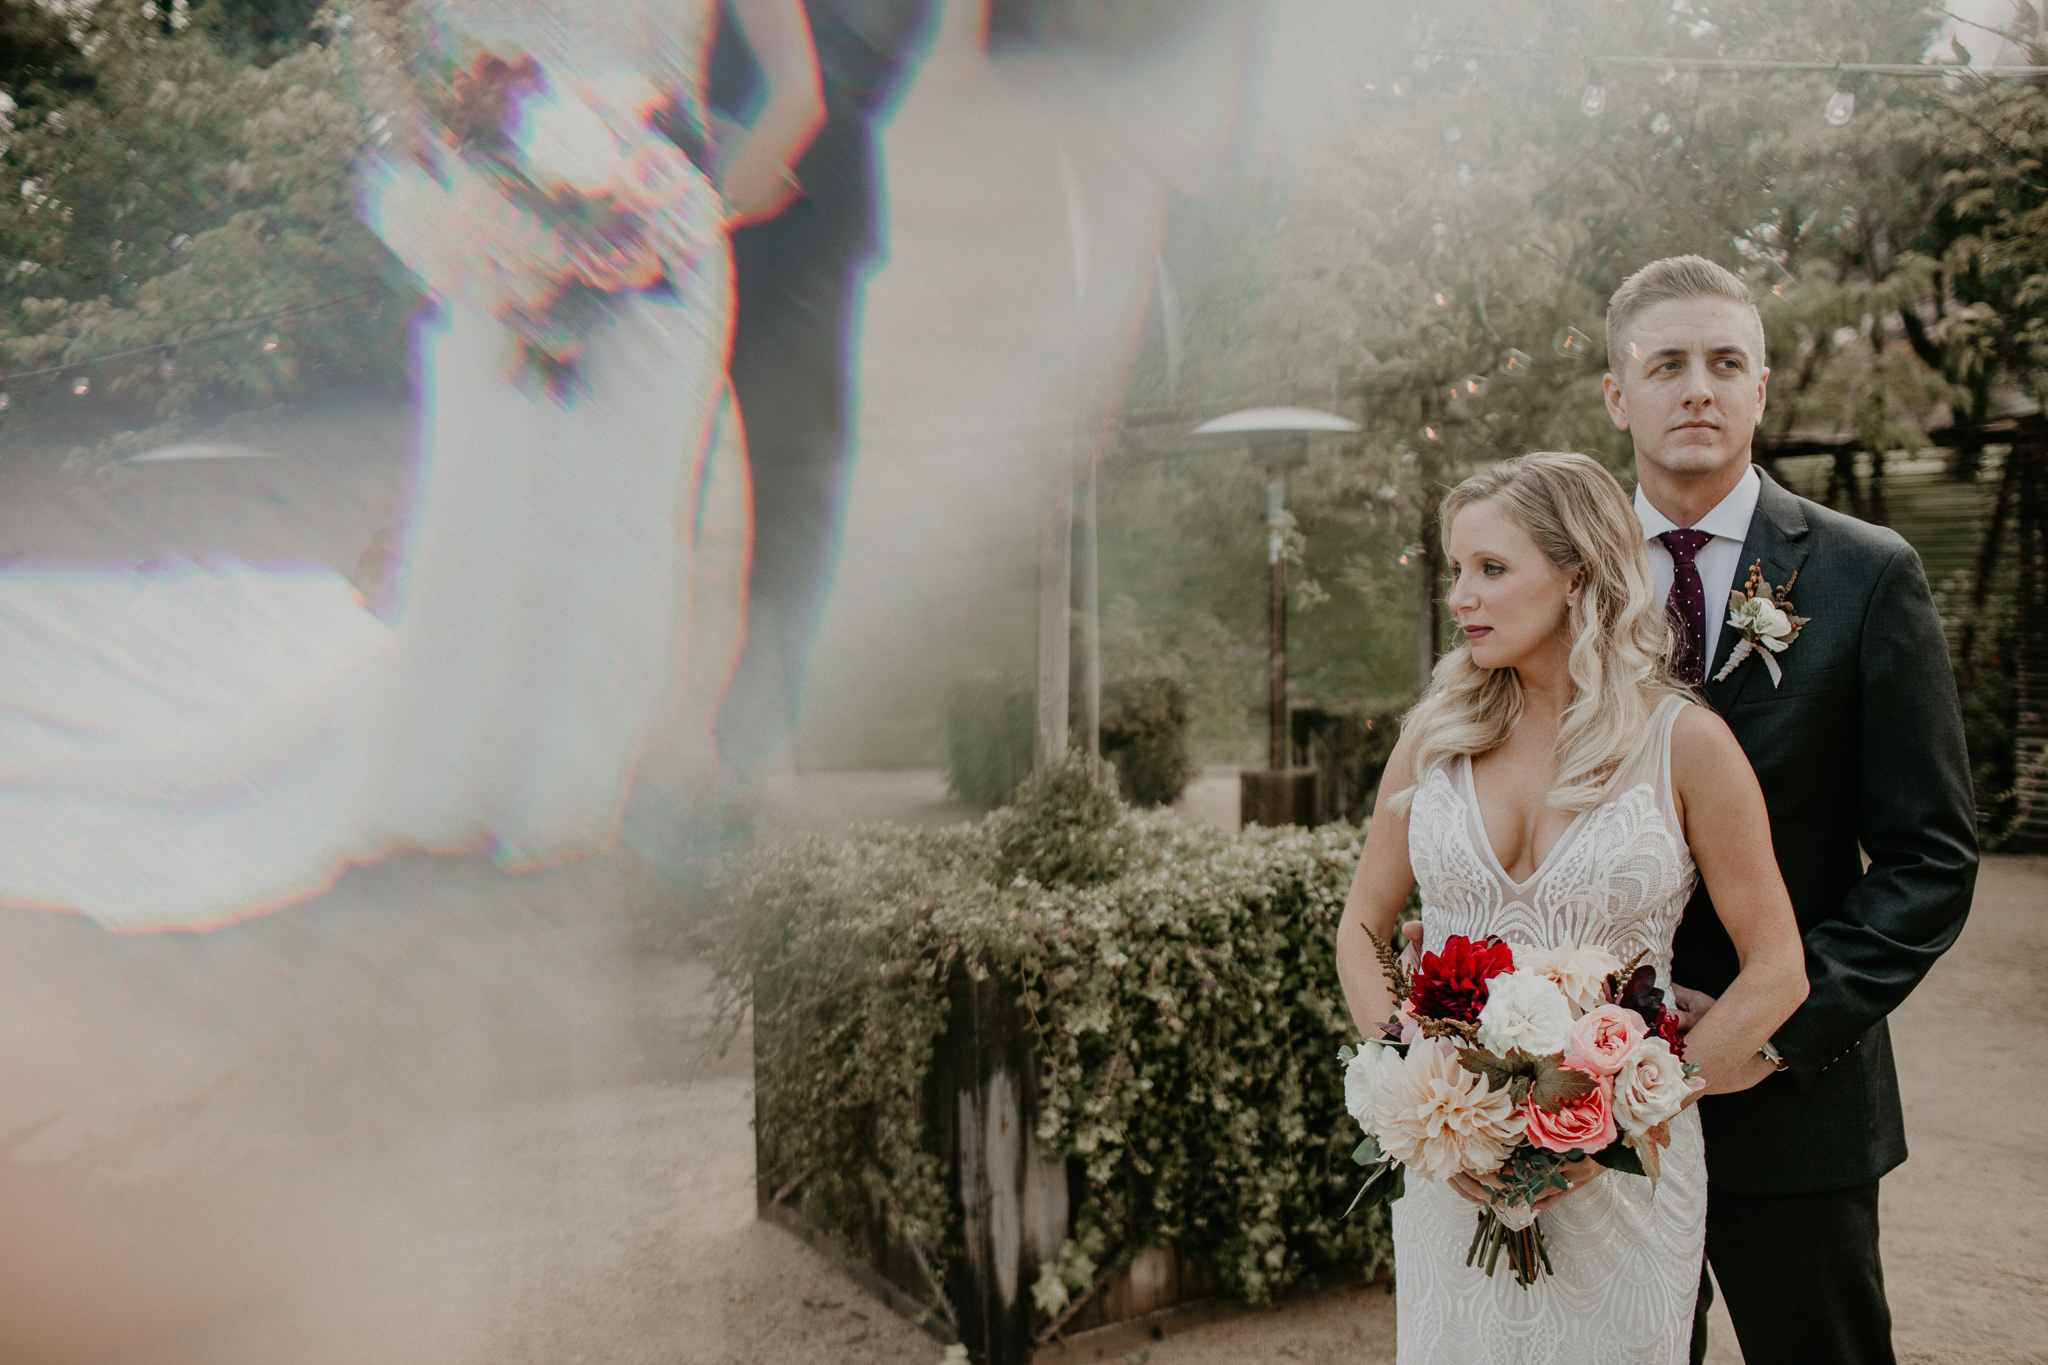 CAITLIN + JAKE     temecula, ca  OCTOBER 13, 2018